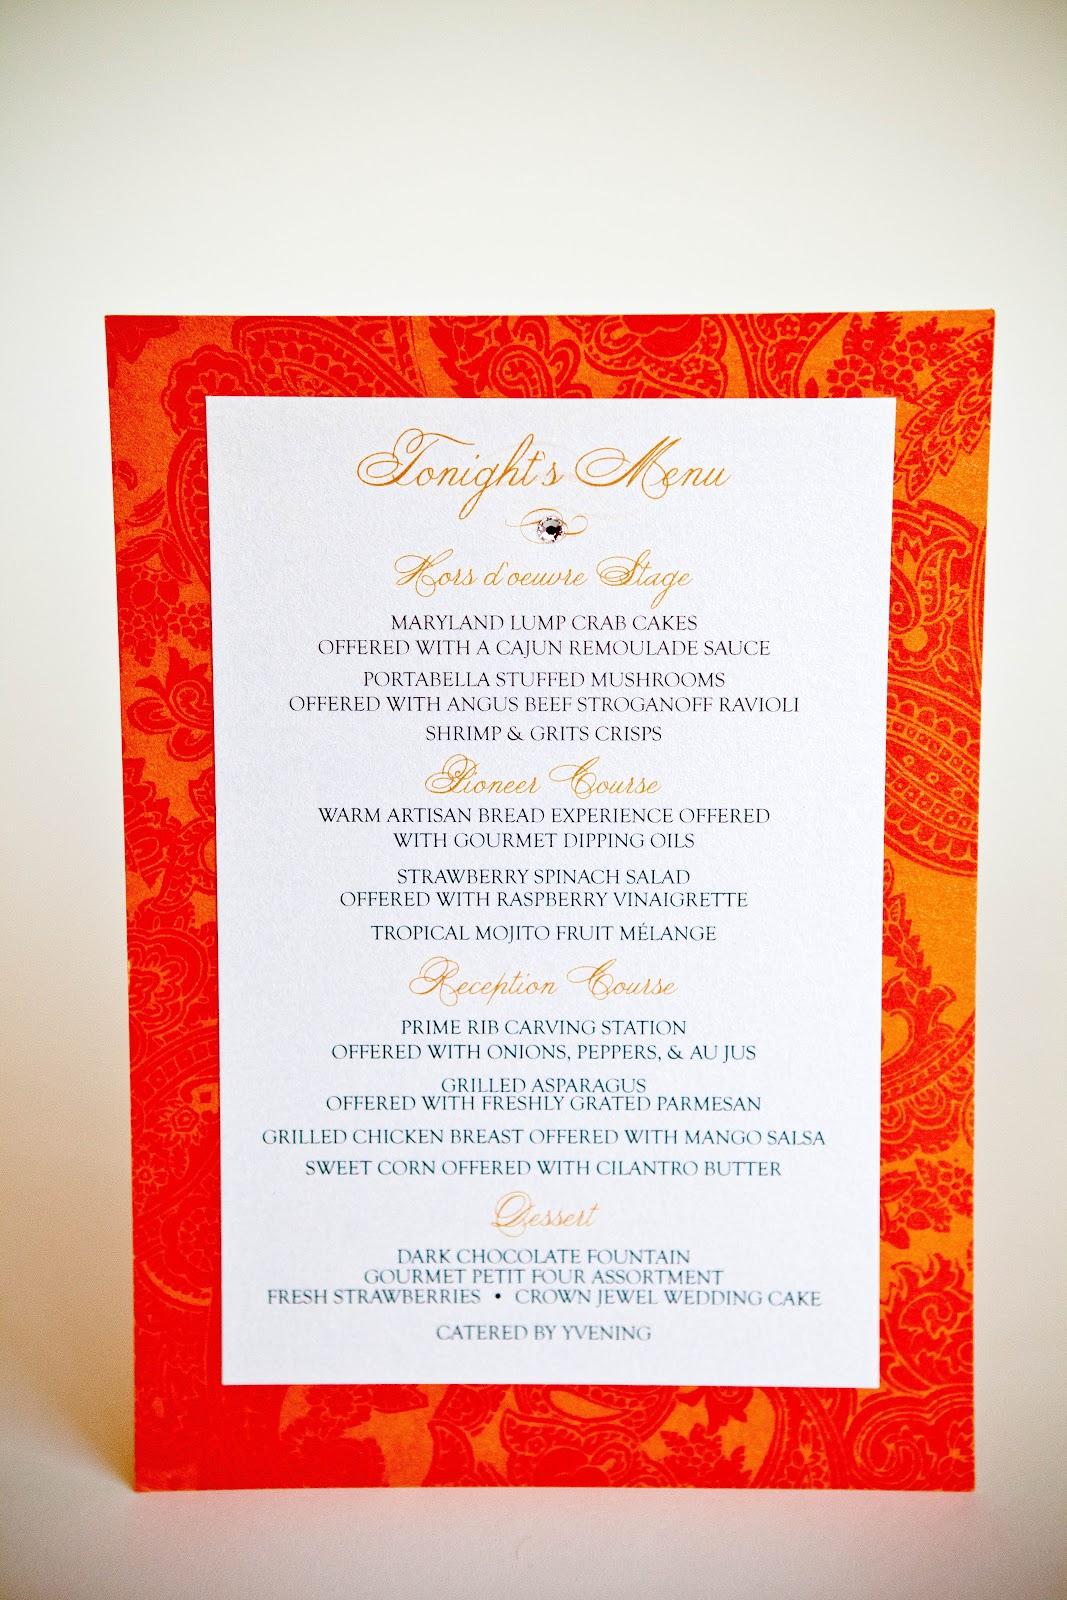 Menu Cards Wedding Baltimore Invitations Kindly RSVP Designs Blog